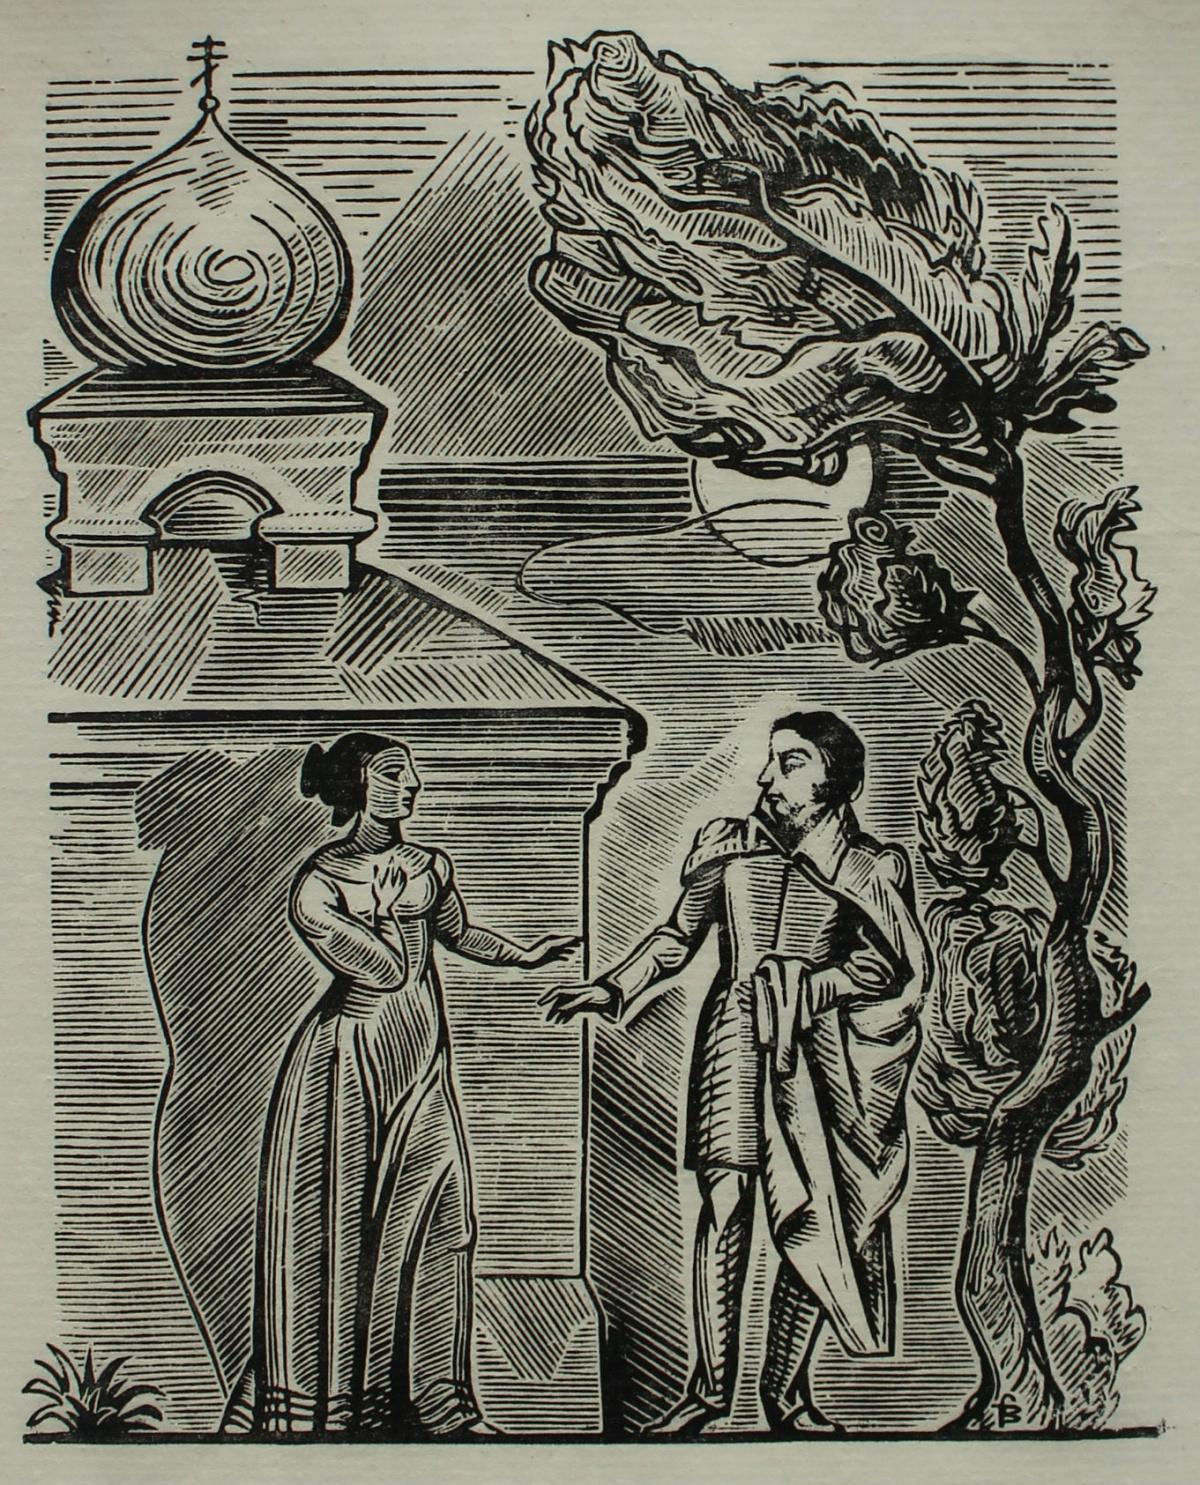 I like it (Adam Mickiewicz) - XX century Black & White Woodcut Print, Figurative